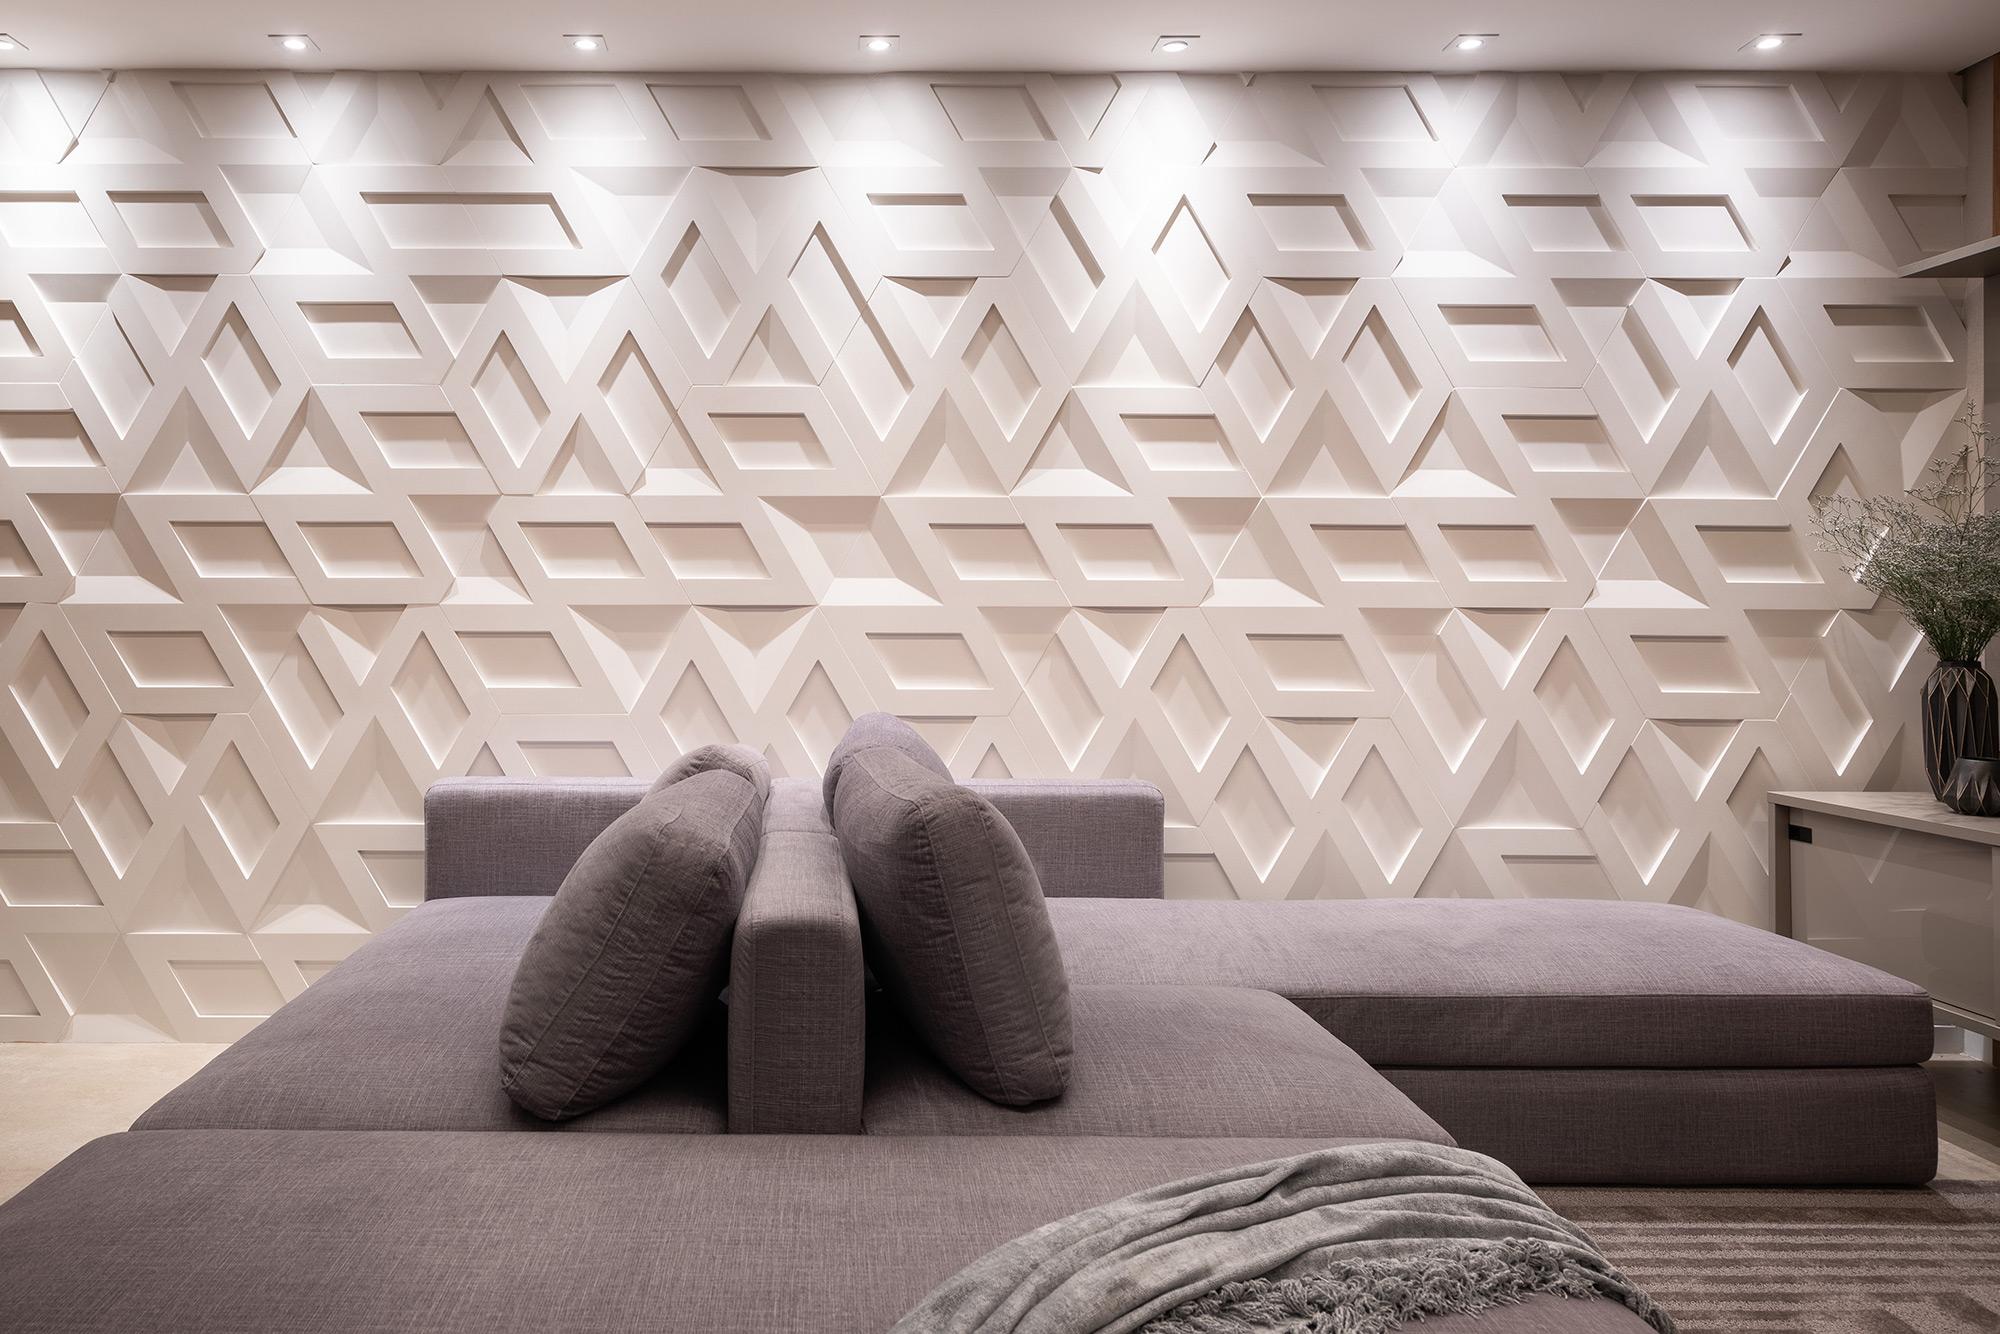 Infinity Paris Branco - Escritório Premazzi Favorito Interiores - Foto KL Fotografia